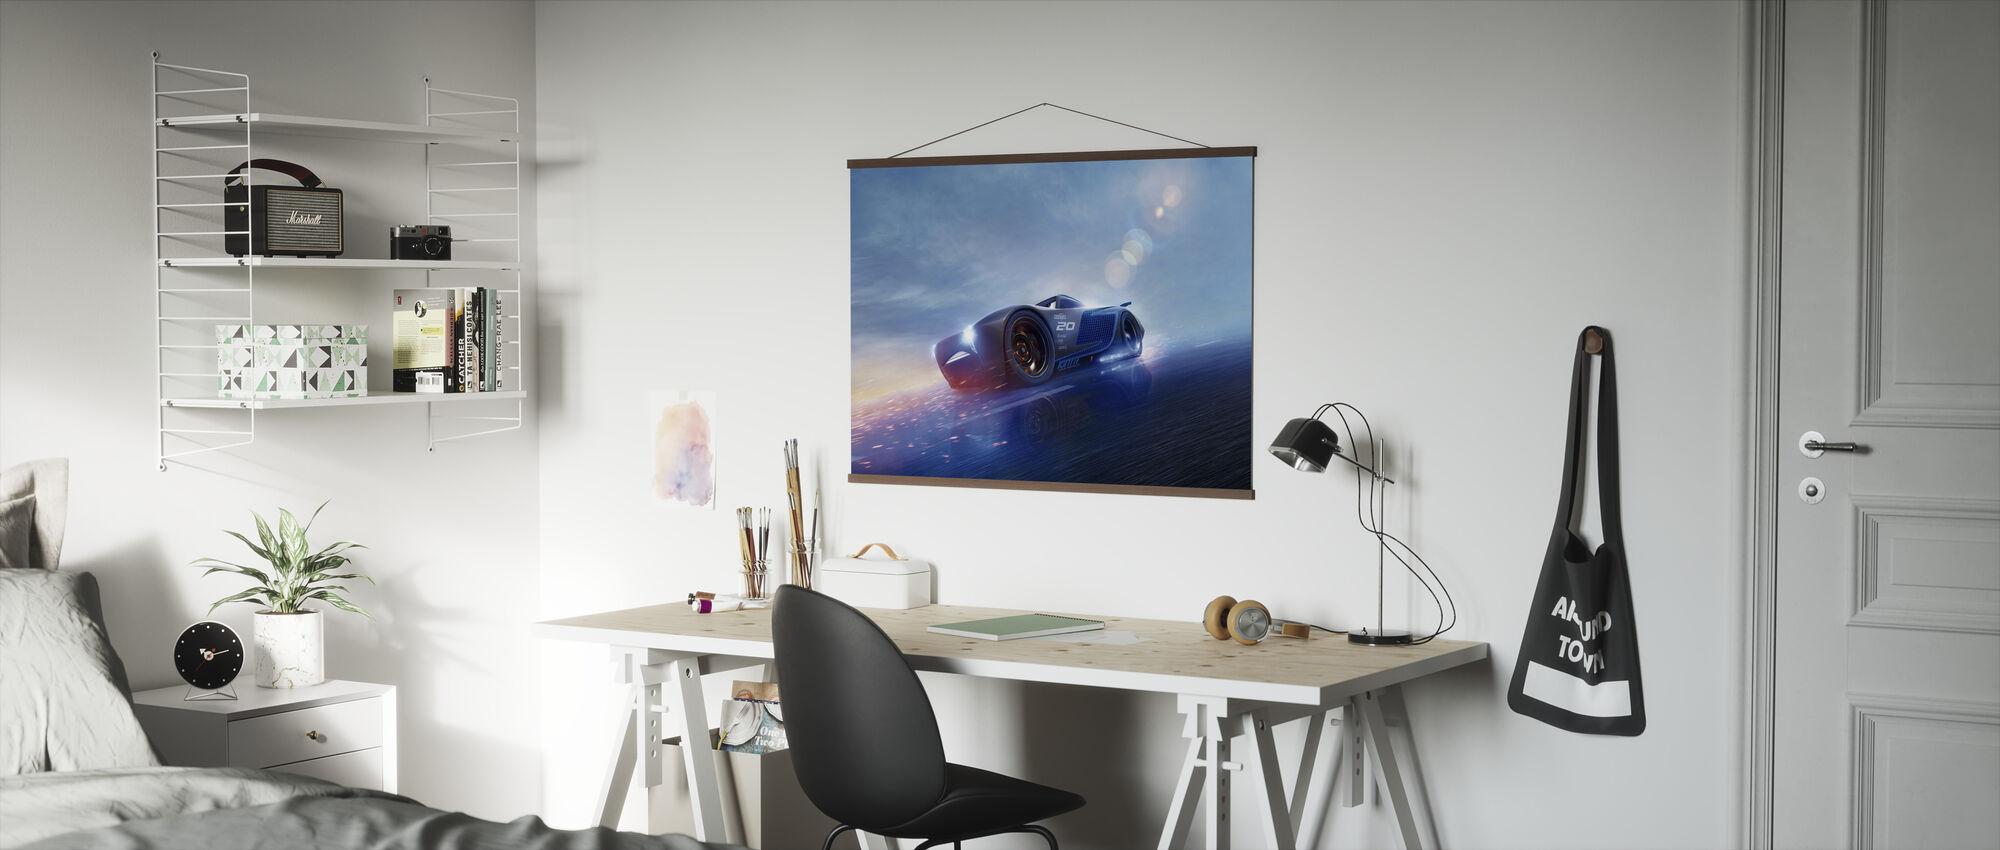 Biler 3 - Jackson Storm 2.0 - Plakat - Kontor